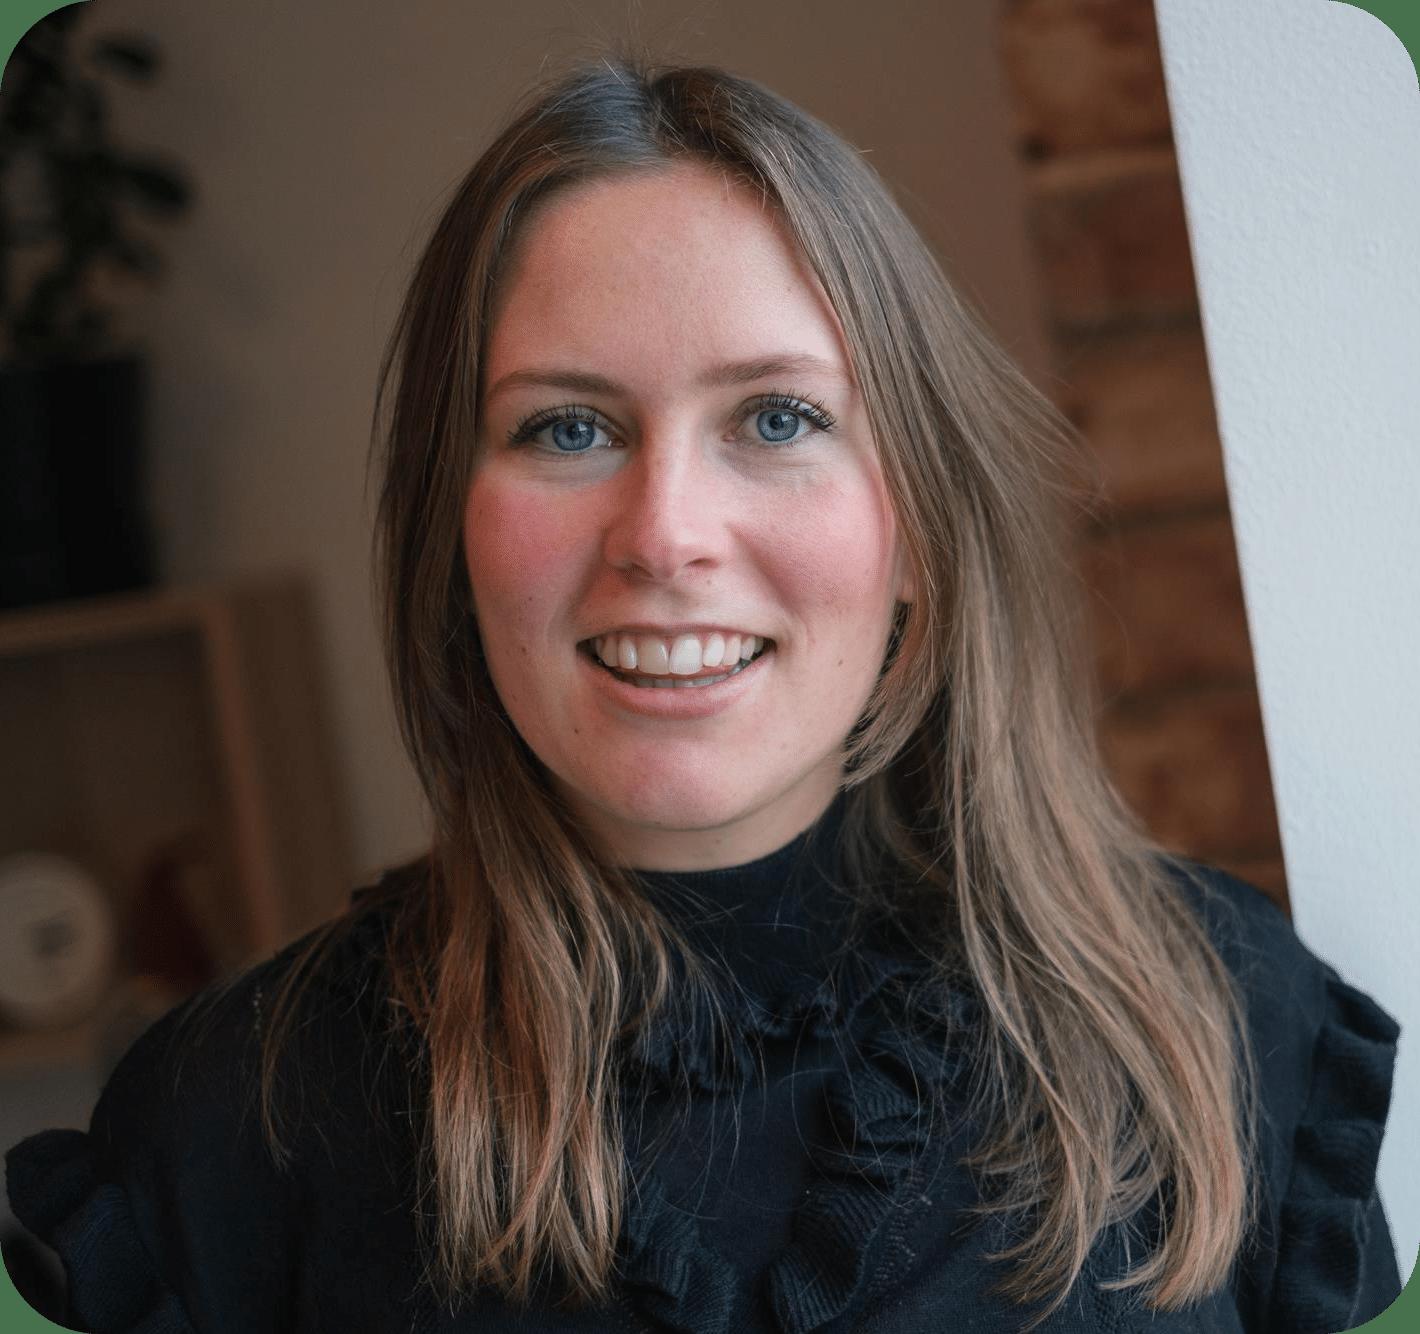 Agnes Lindell, head of Data Driven at Elvenite